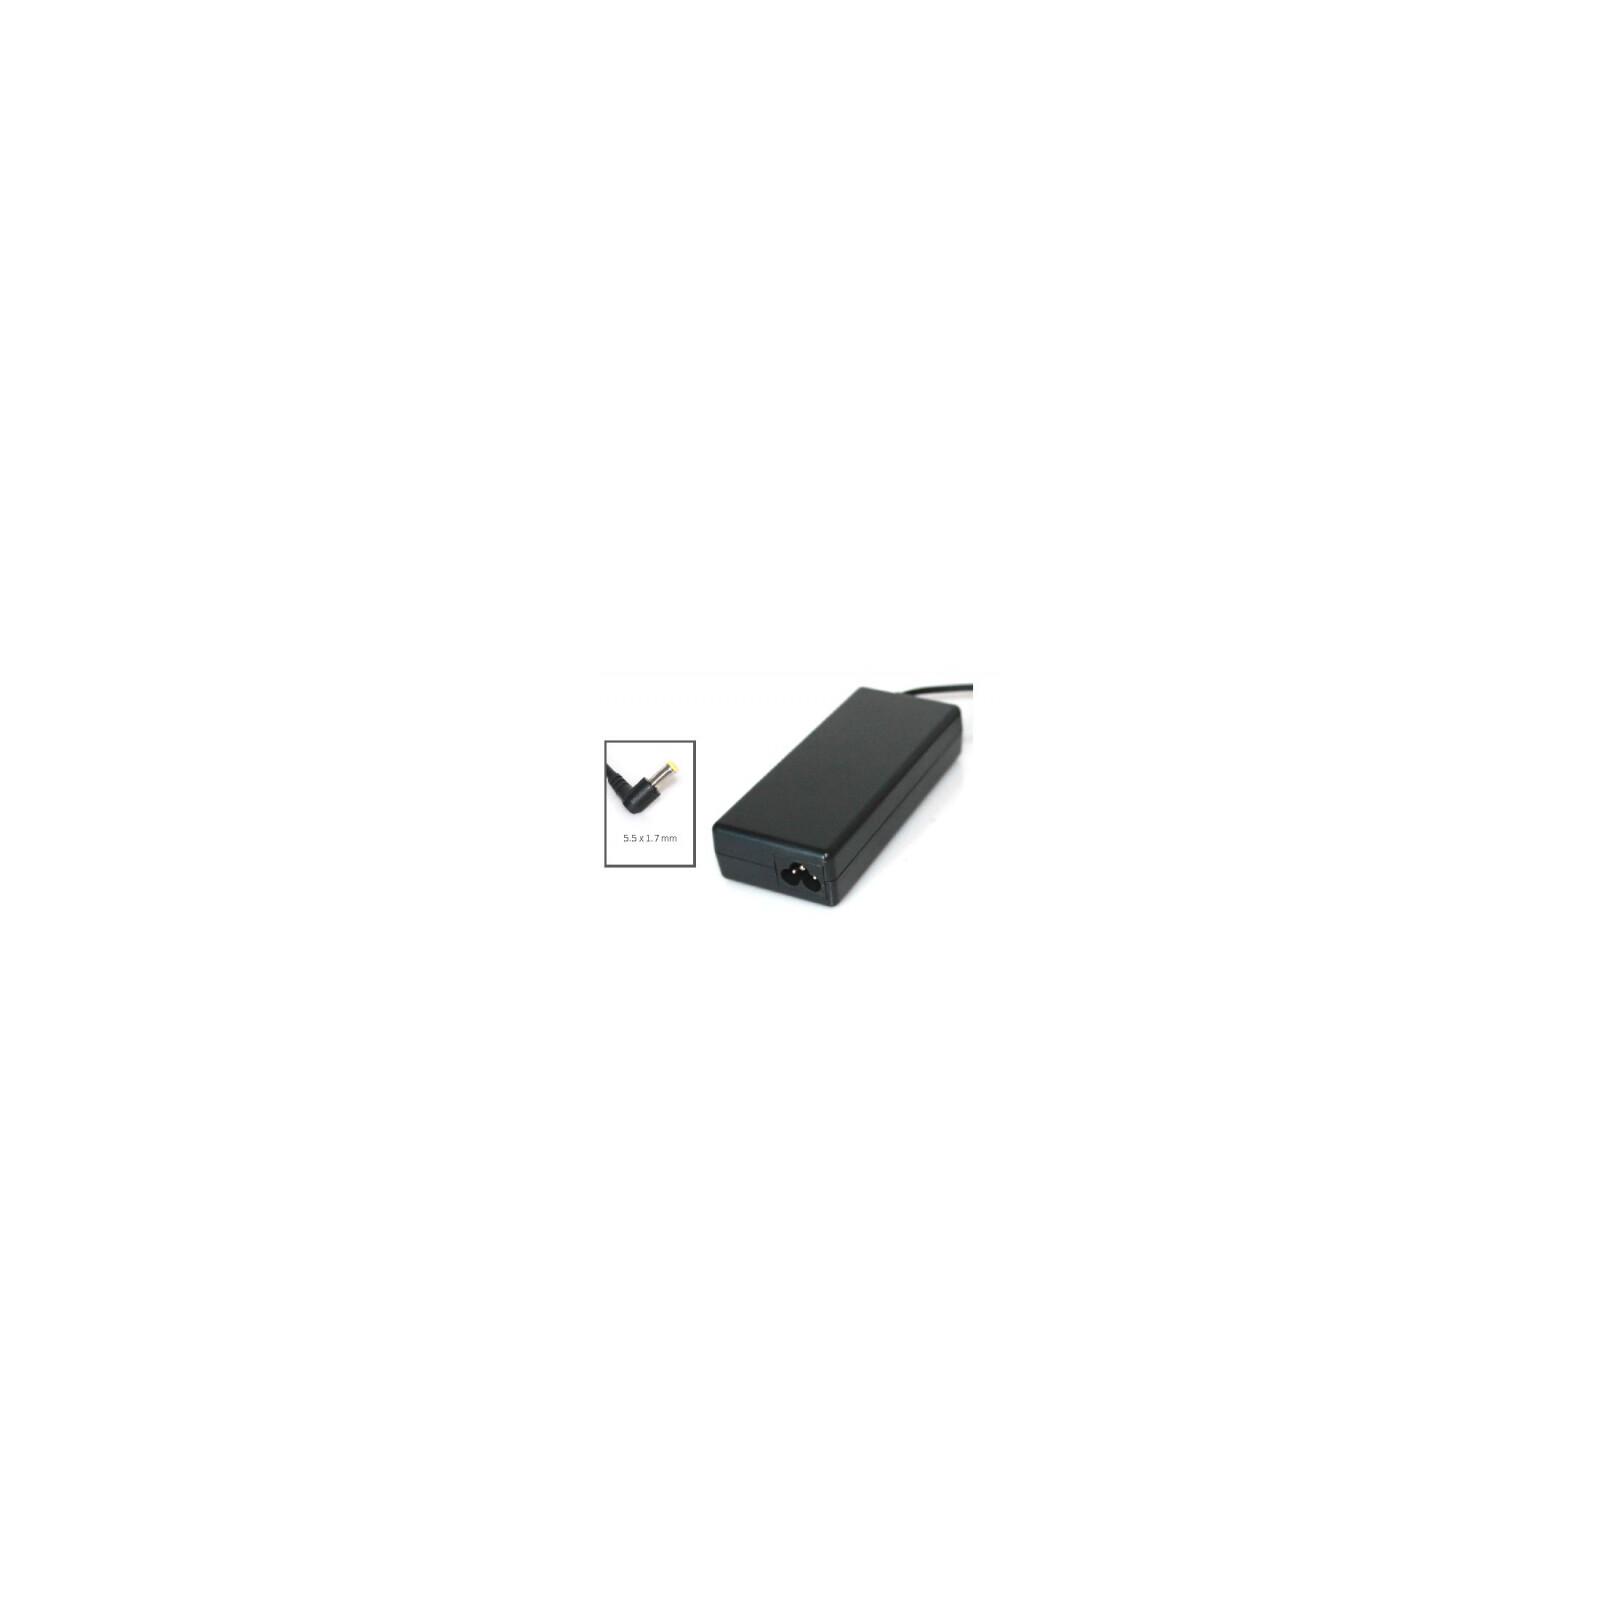 AGI Netzteil Acer Aspire 5520 90W